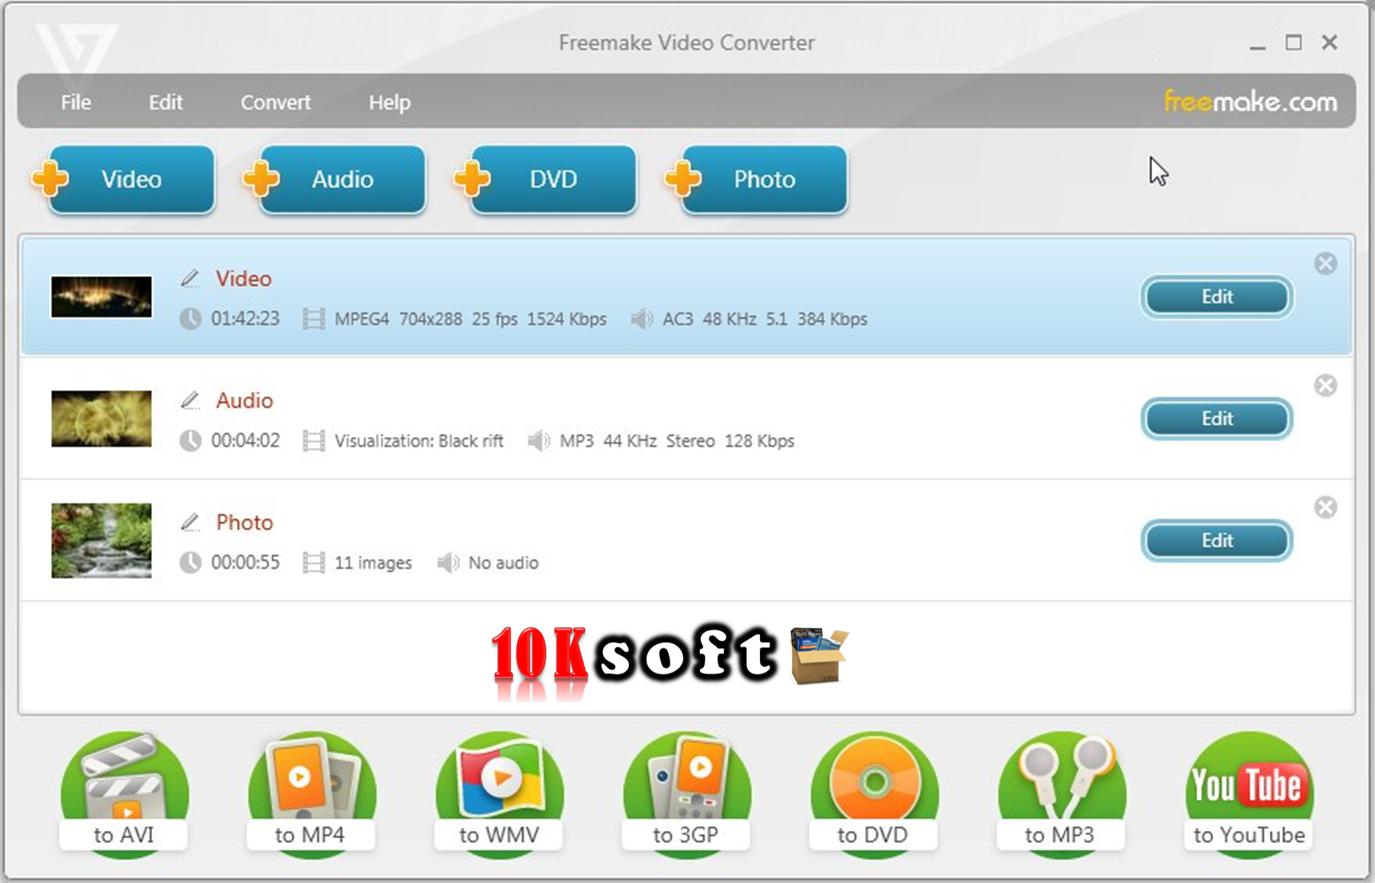 Freemake video convertor free download direct link